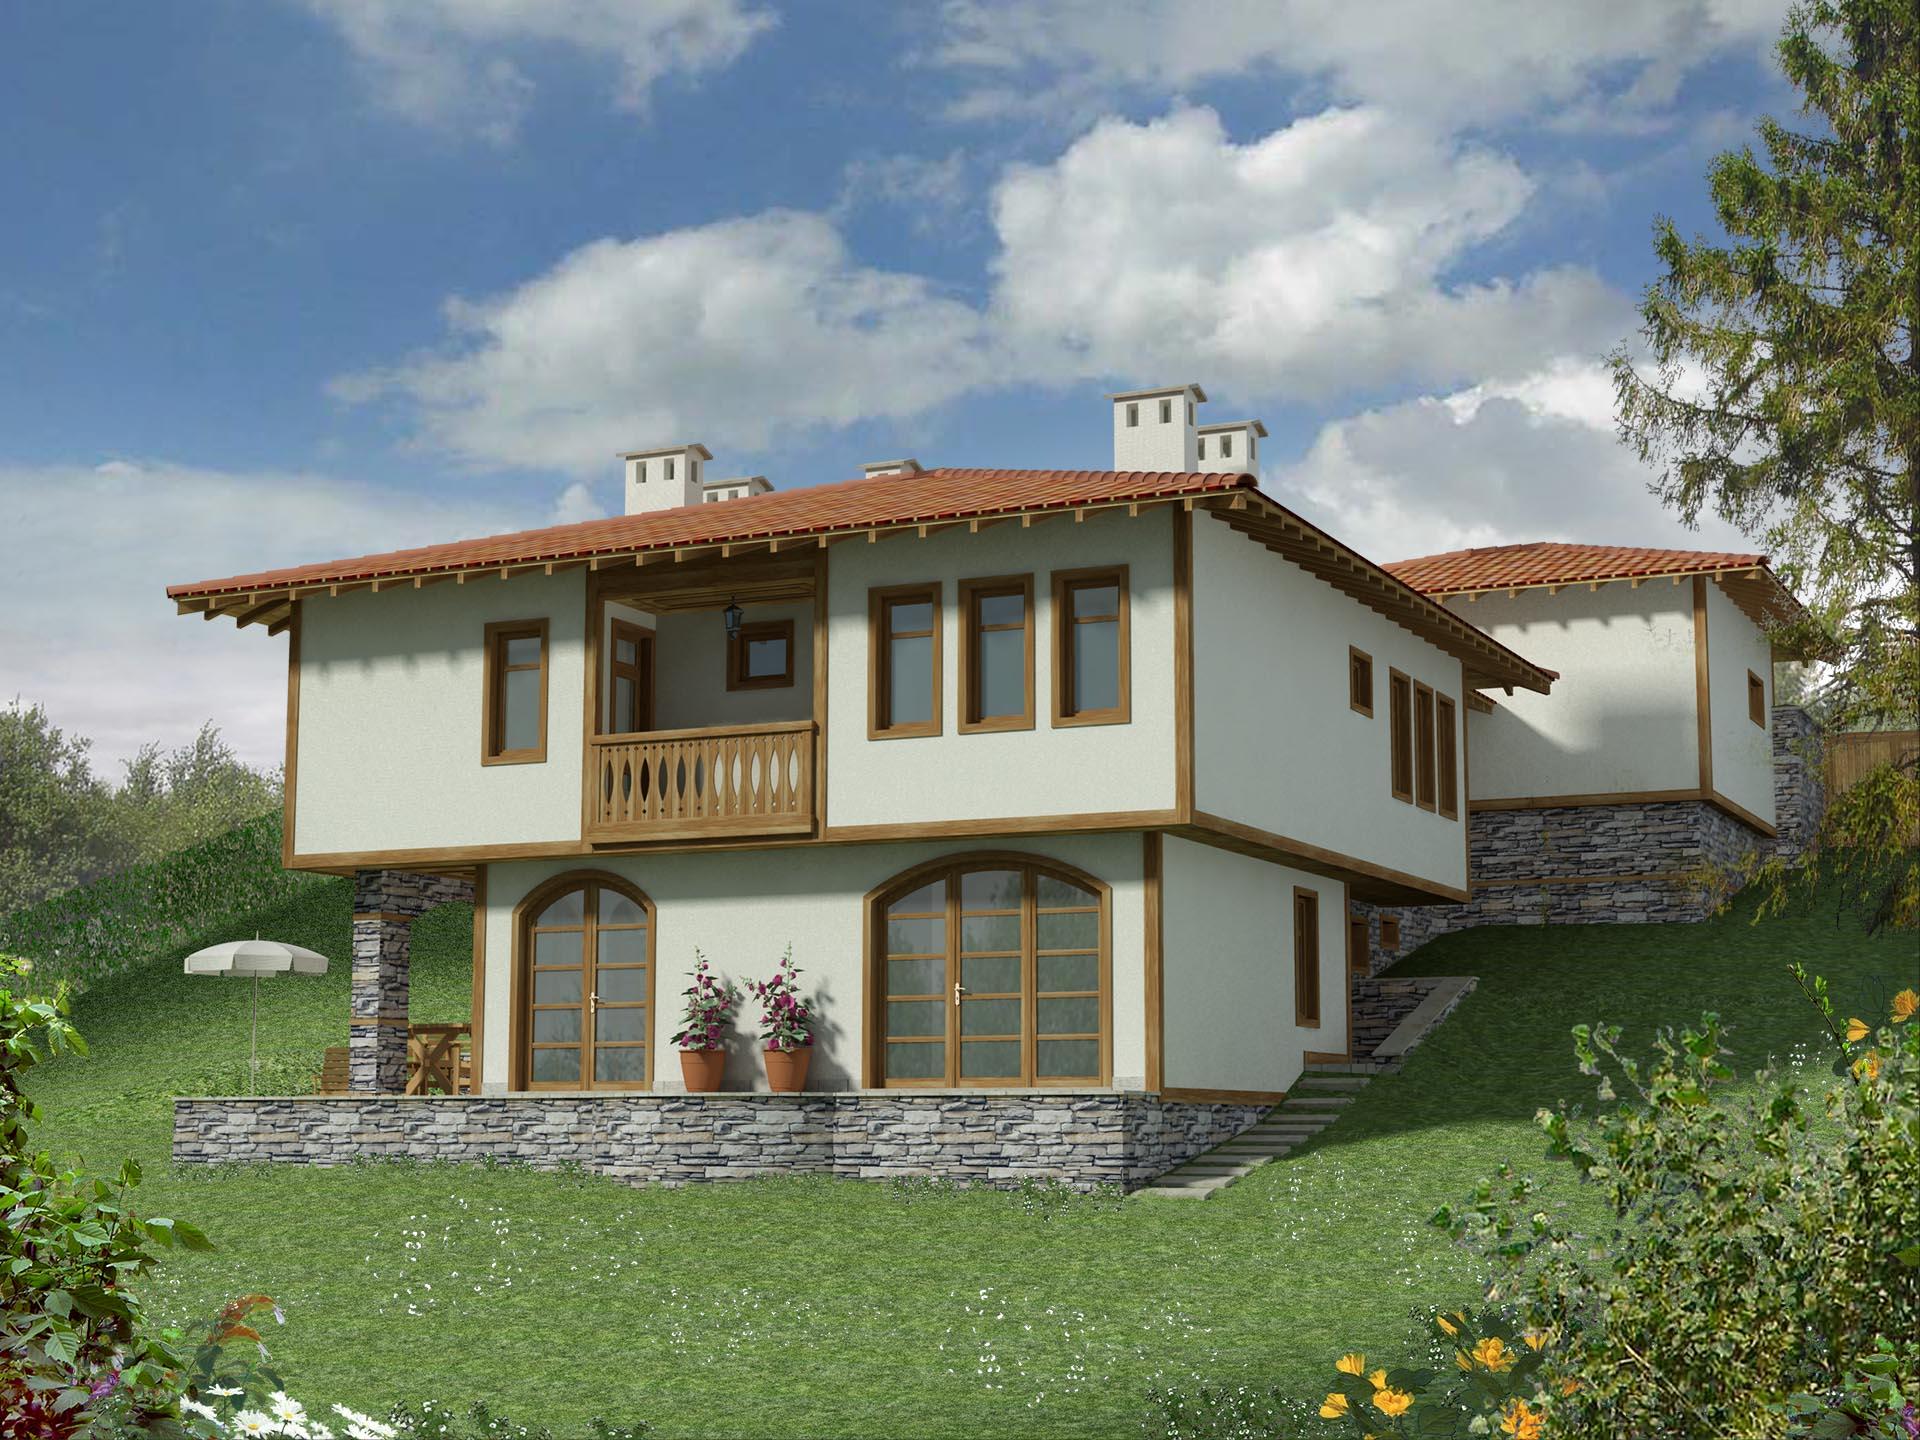 Yovchevi House 01